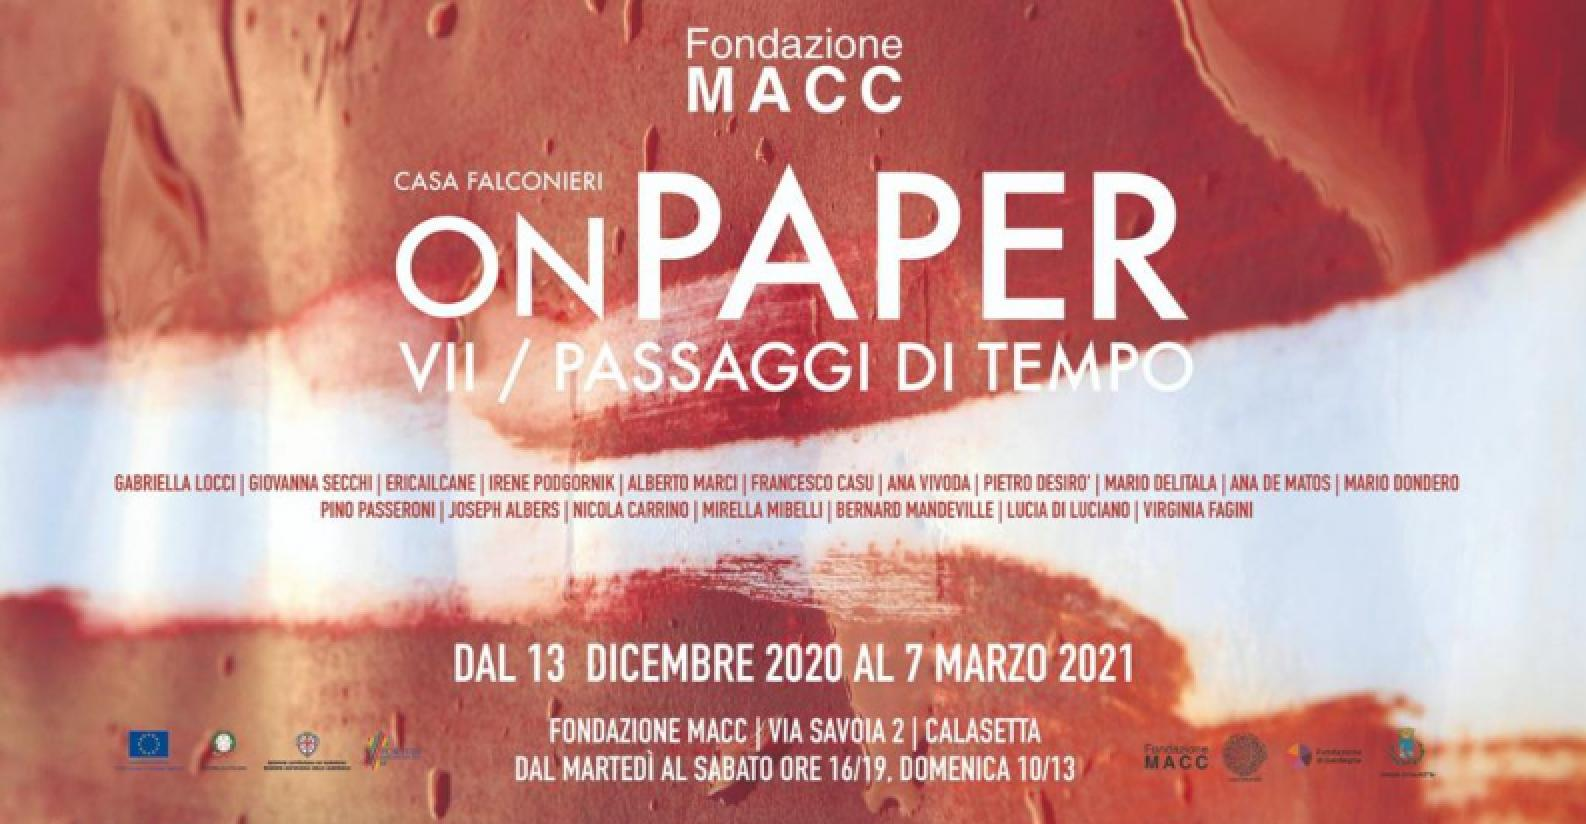 on_paper_vii_macc_calasetta